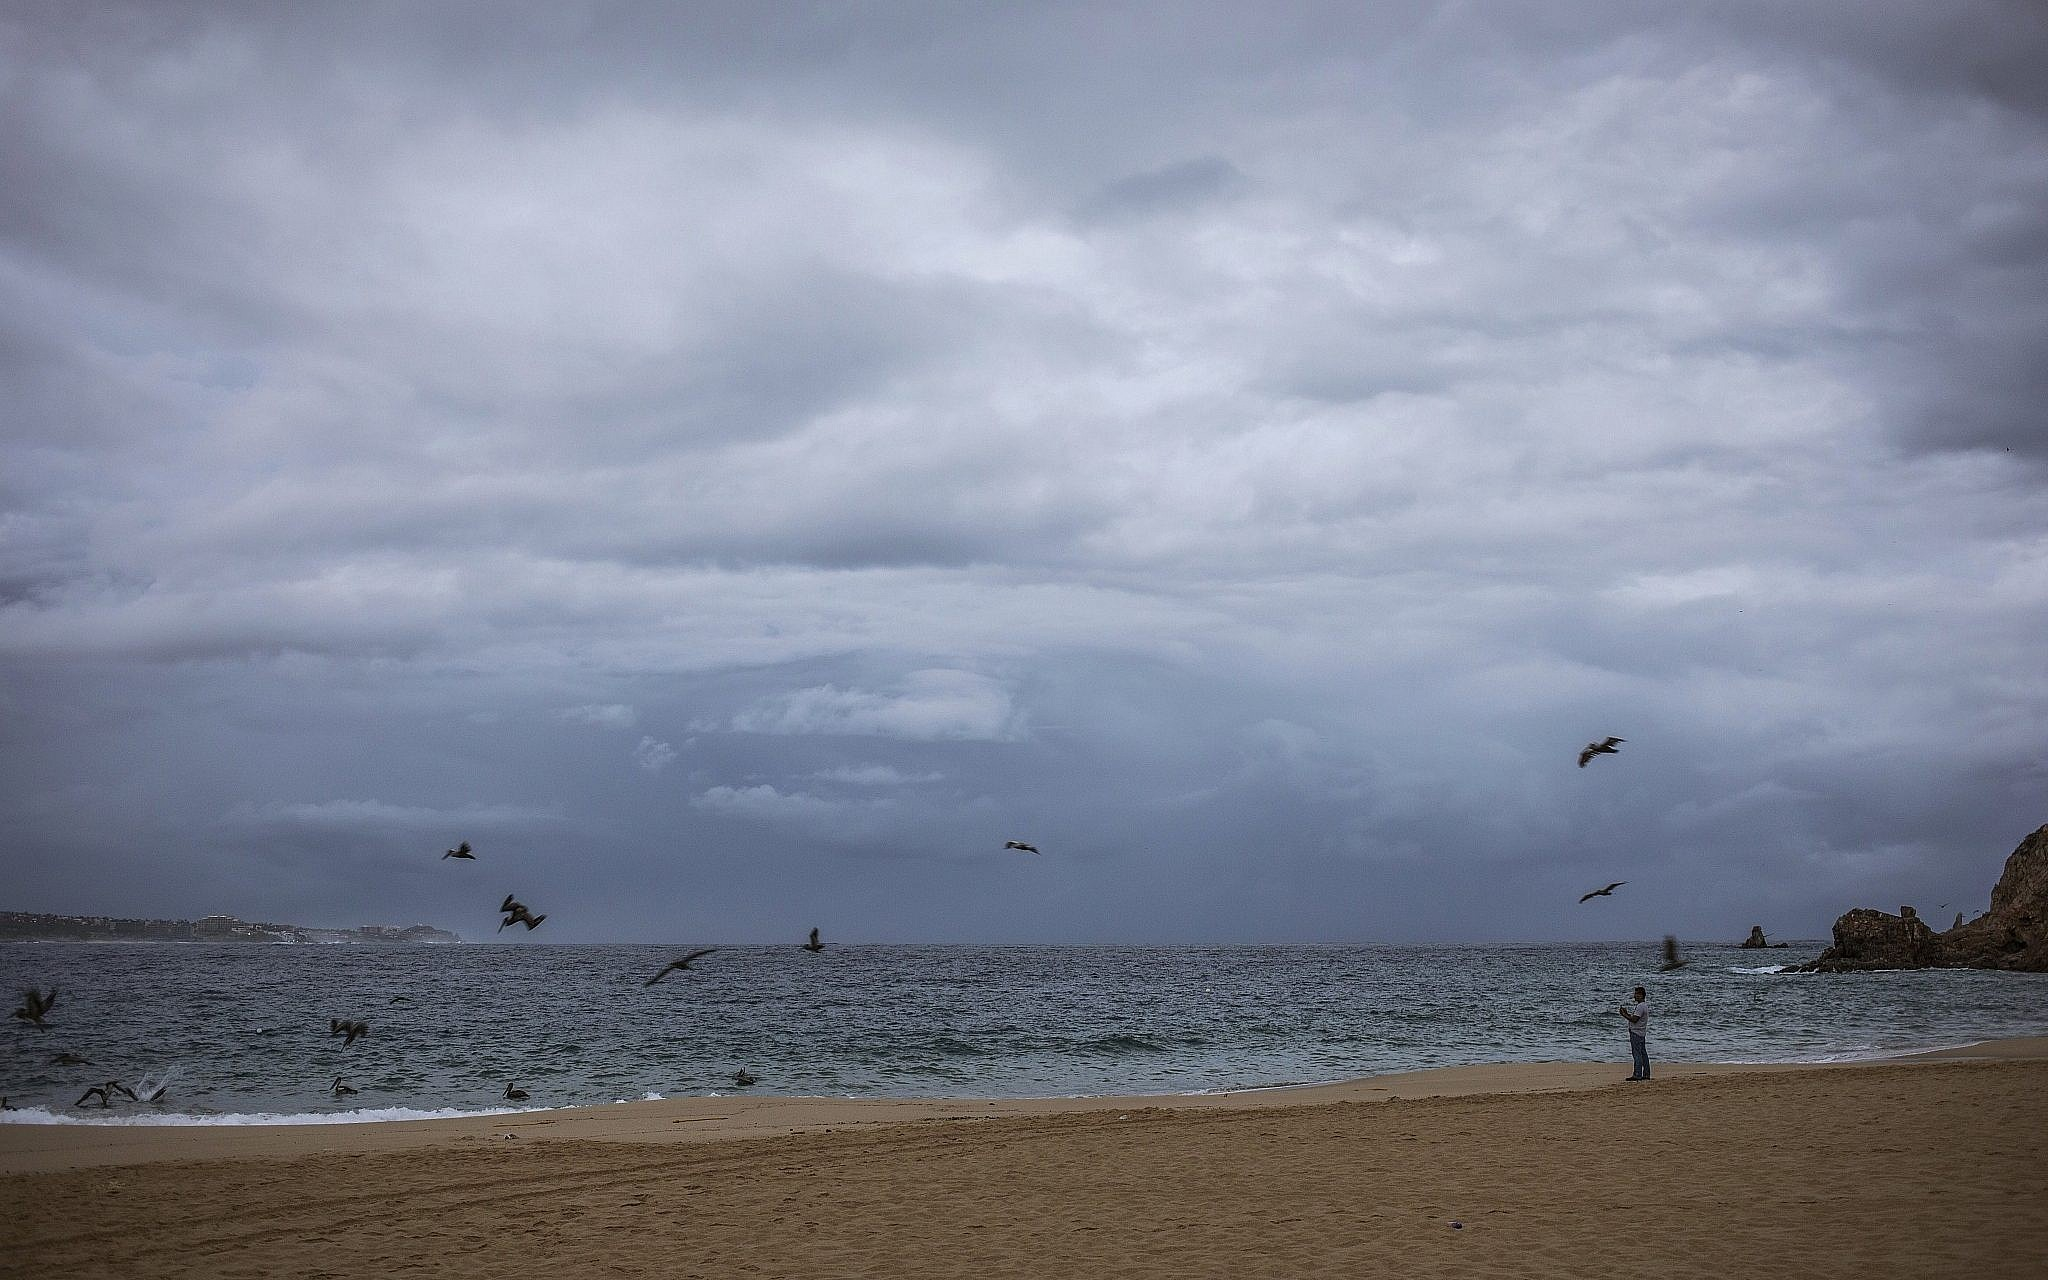 Hurricane Lorena threatens Mexico's Los Cabos resorts with heavy rain, wind